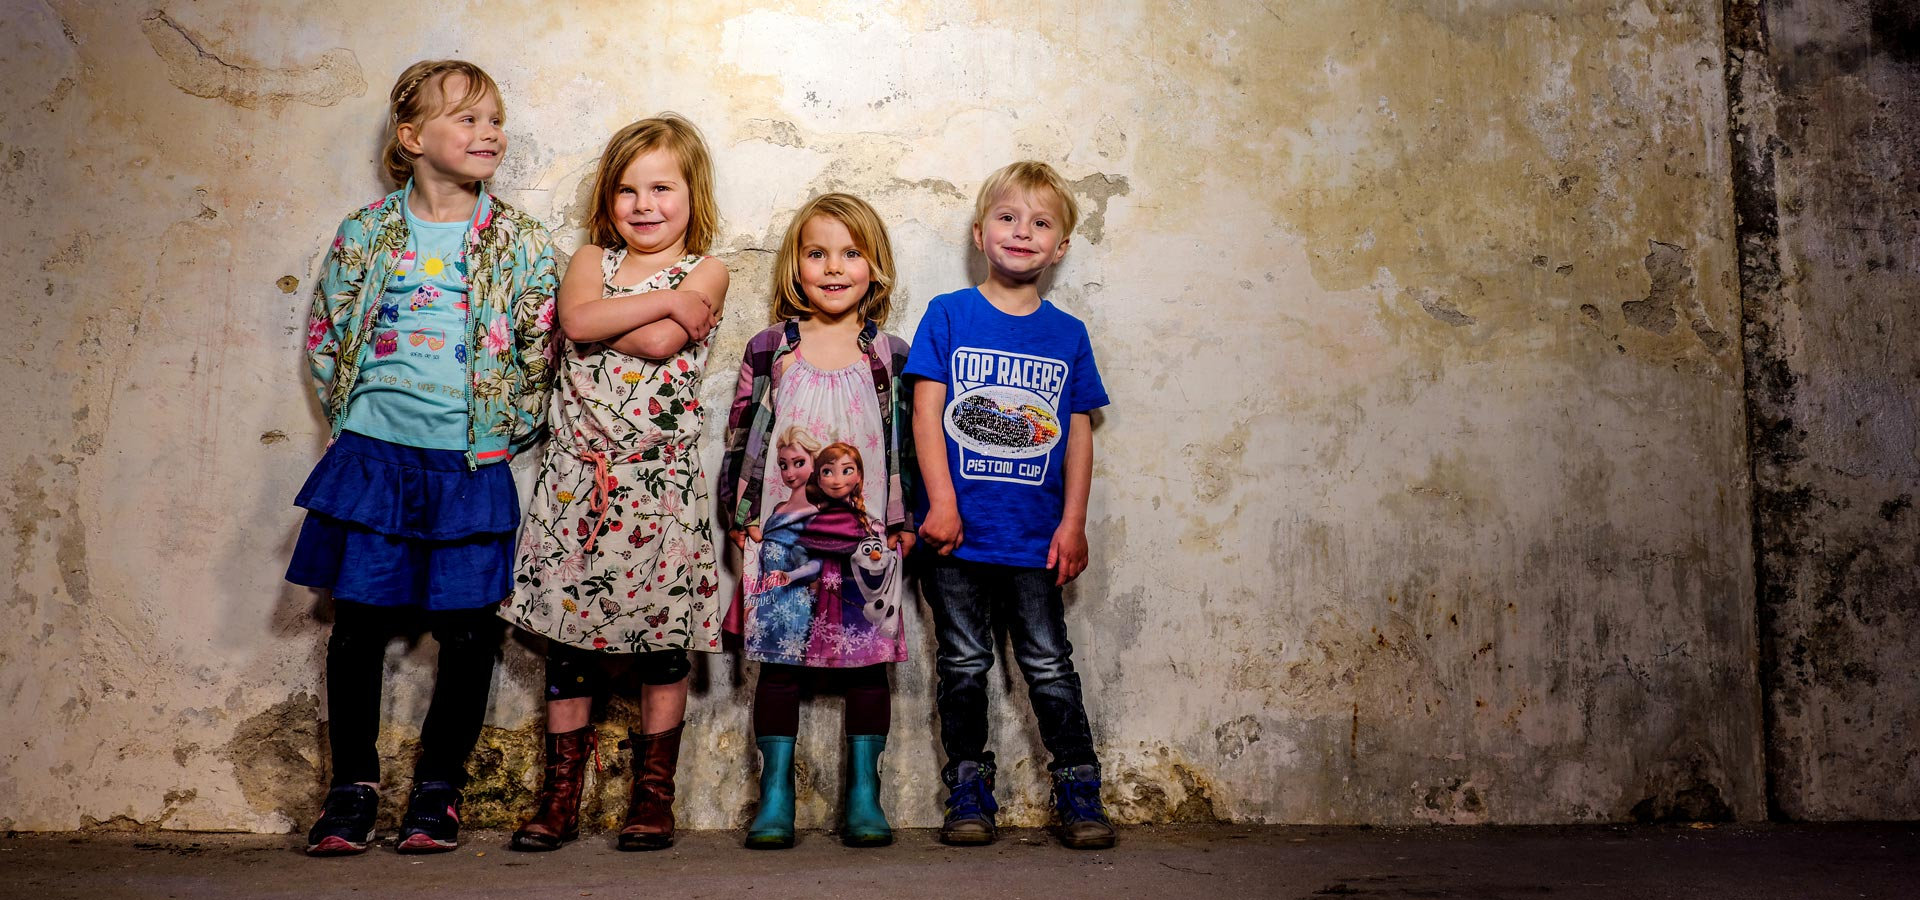 Kinderfotografie kleur